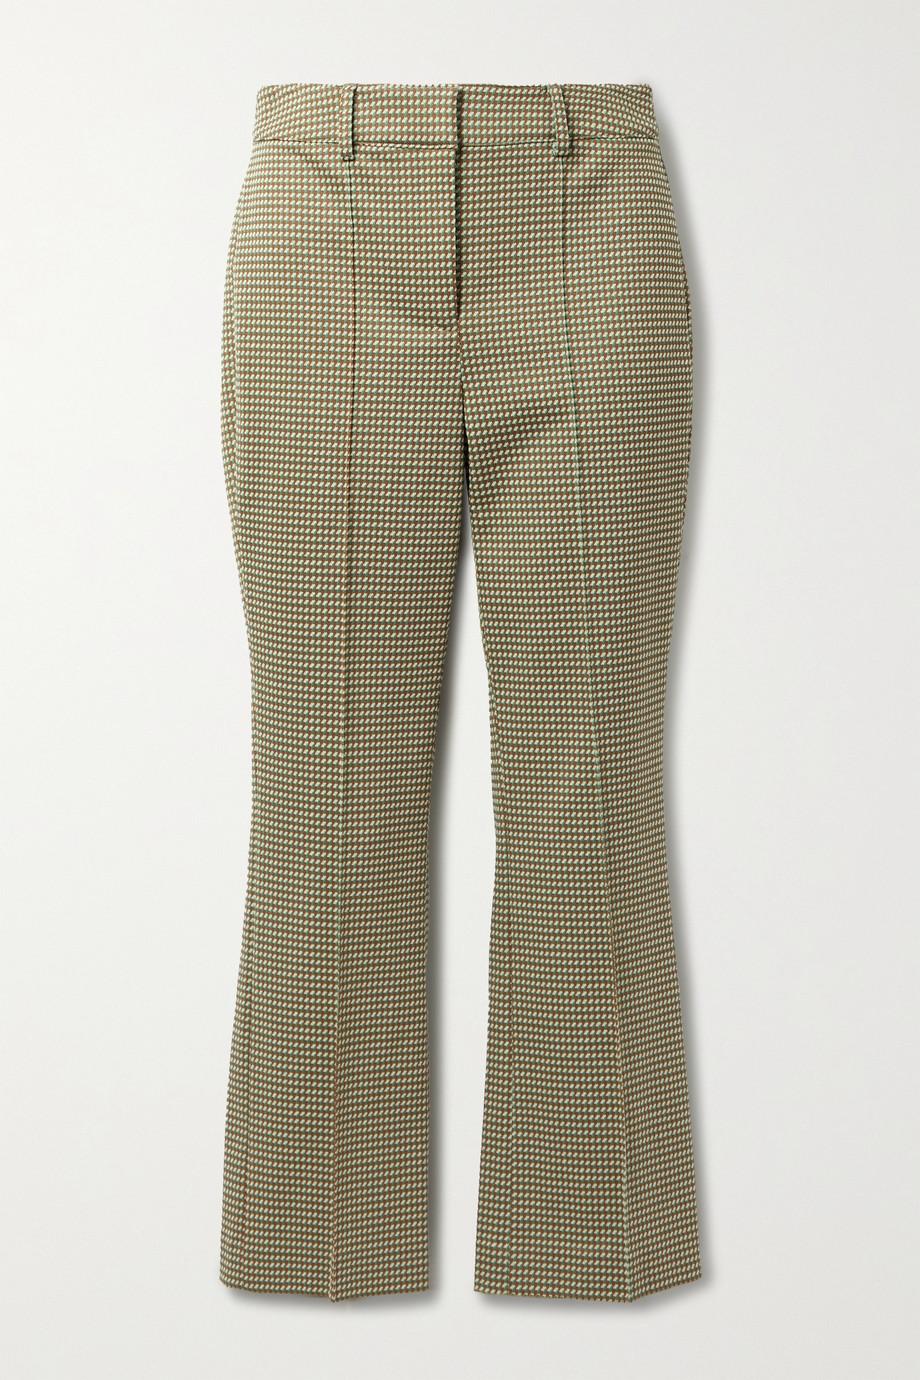 Veronica Beard Gani cropped jacquard flared pants